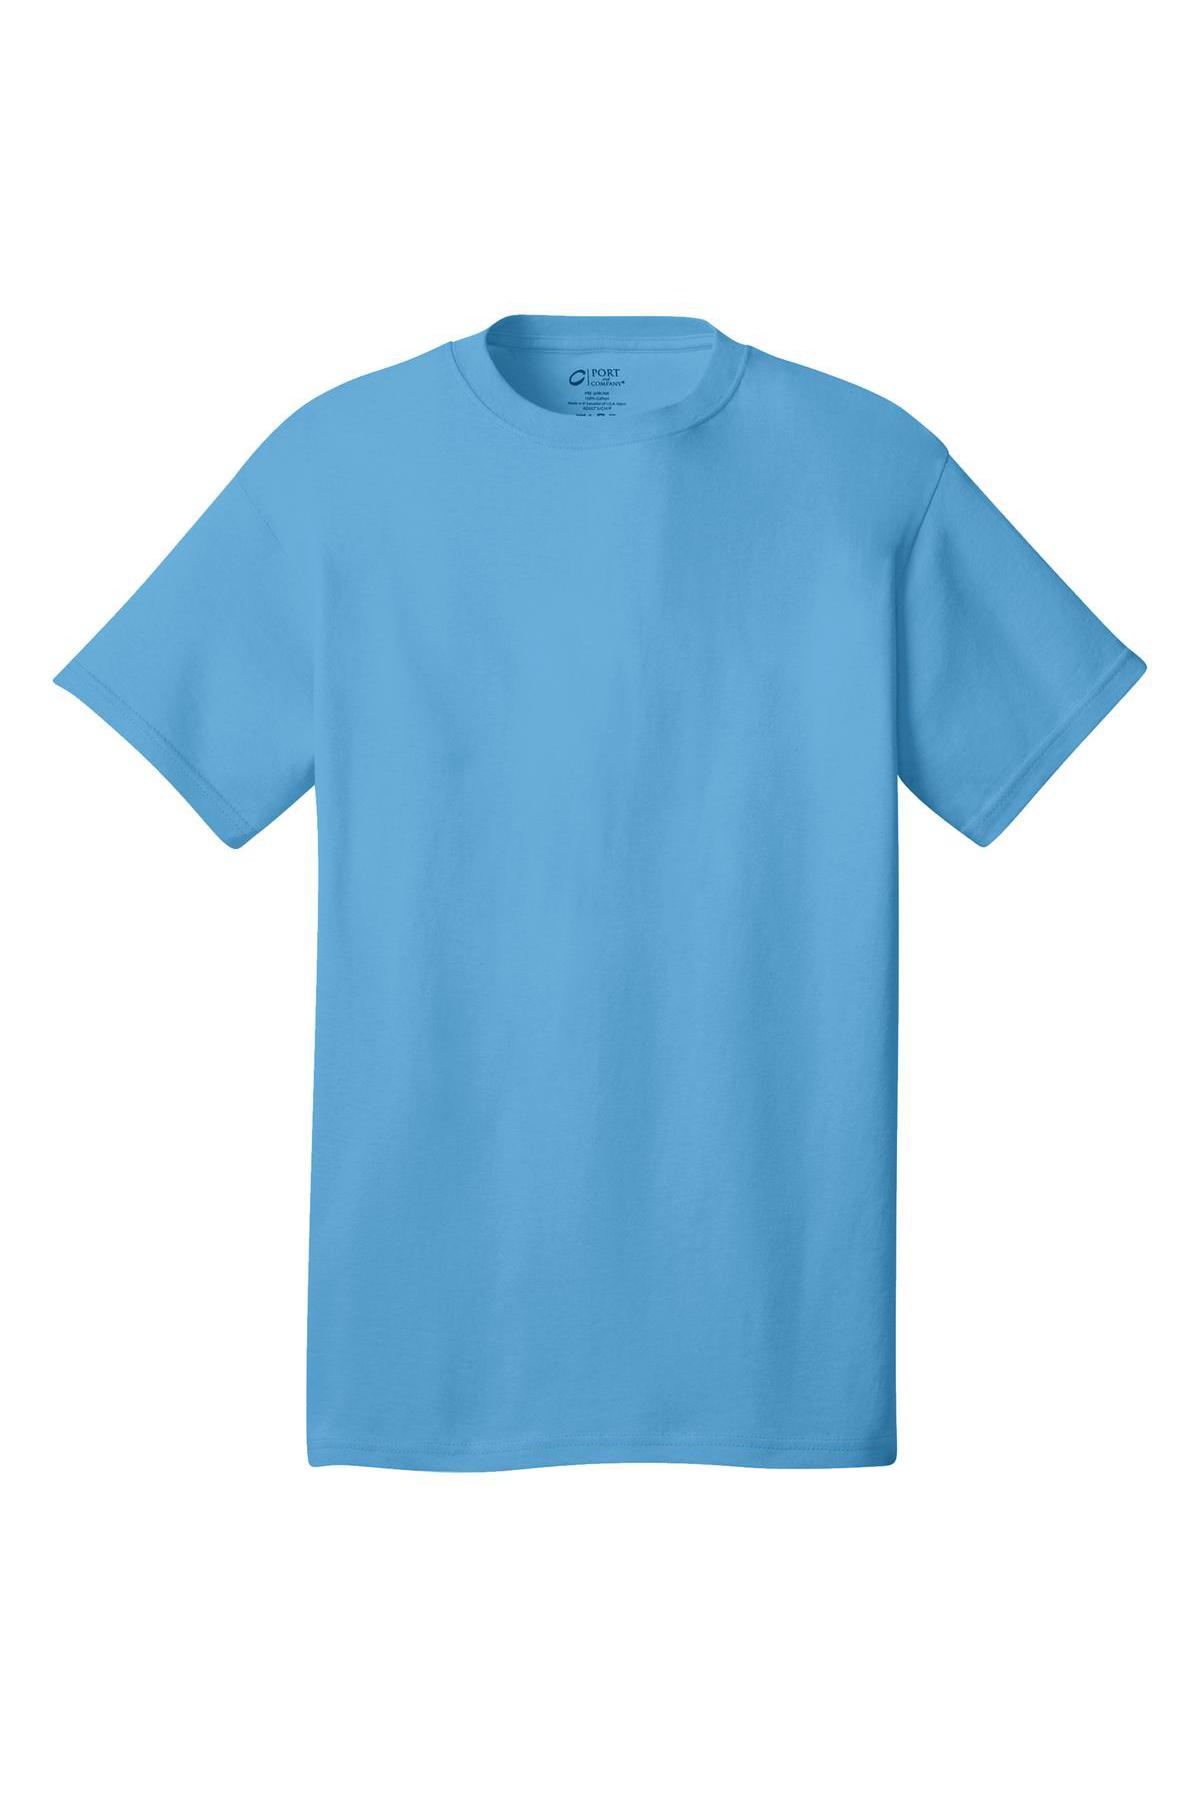 50 50 Outlet >> Port & Company® - Core Cotton Tee | 5-5.6 100% Cotton | T ...